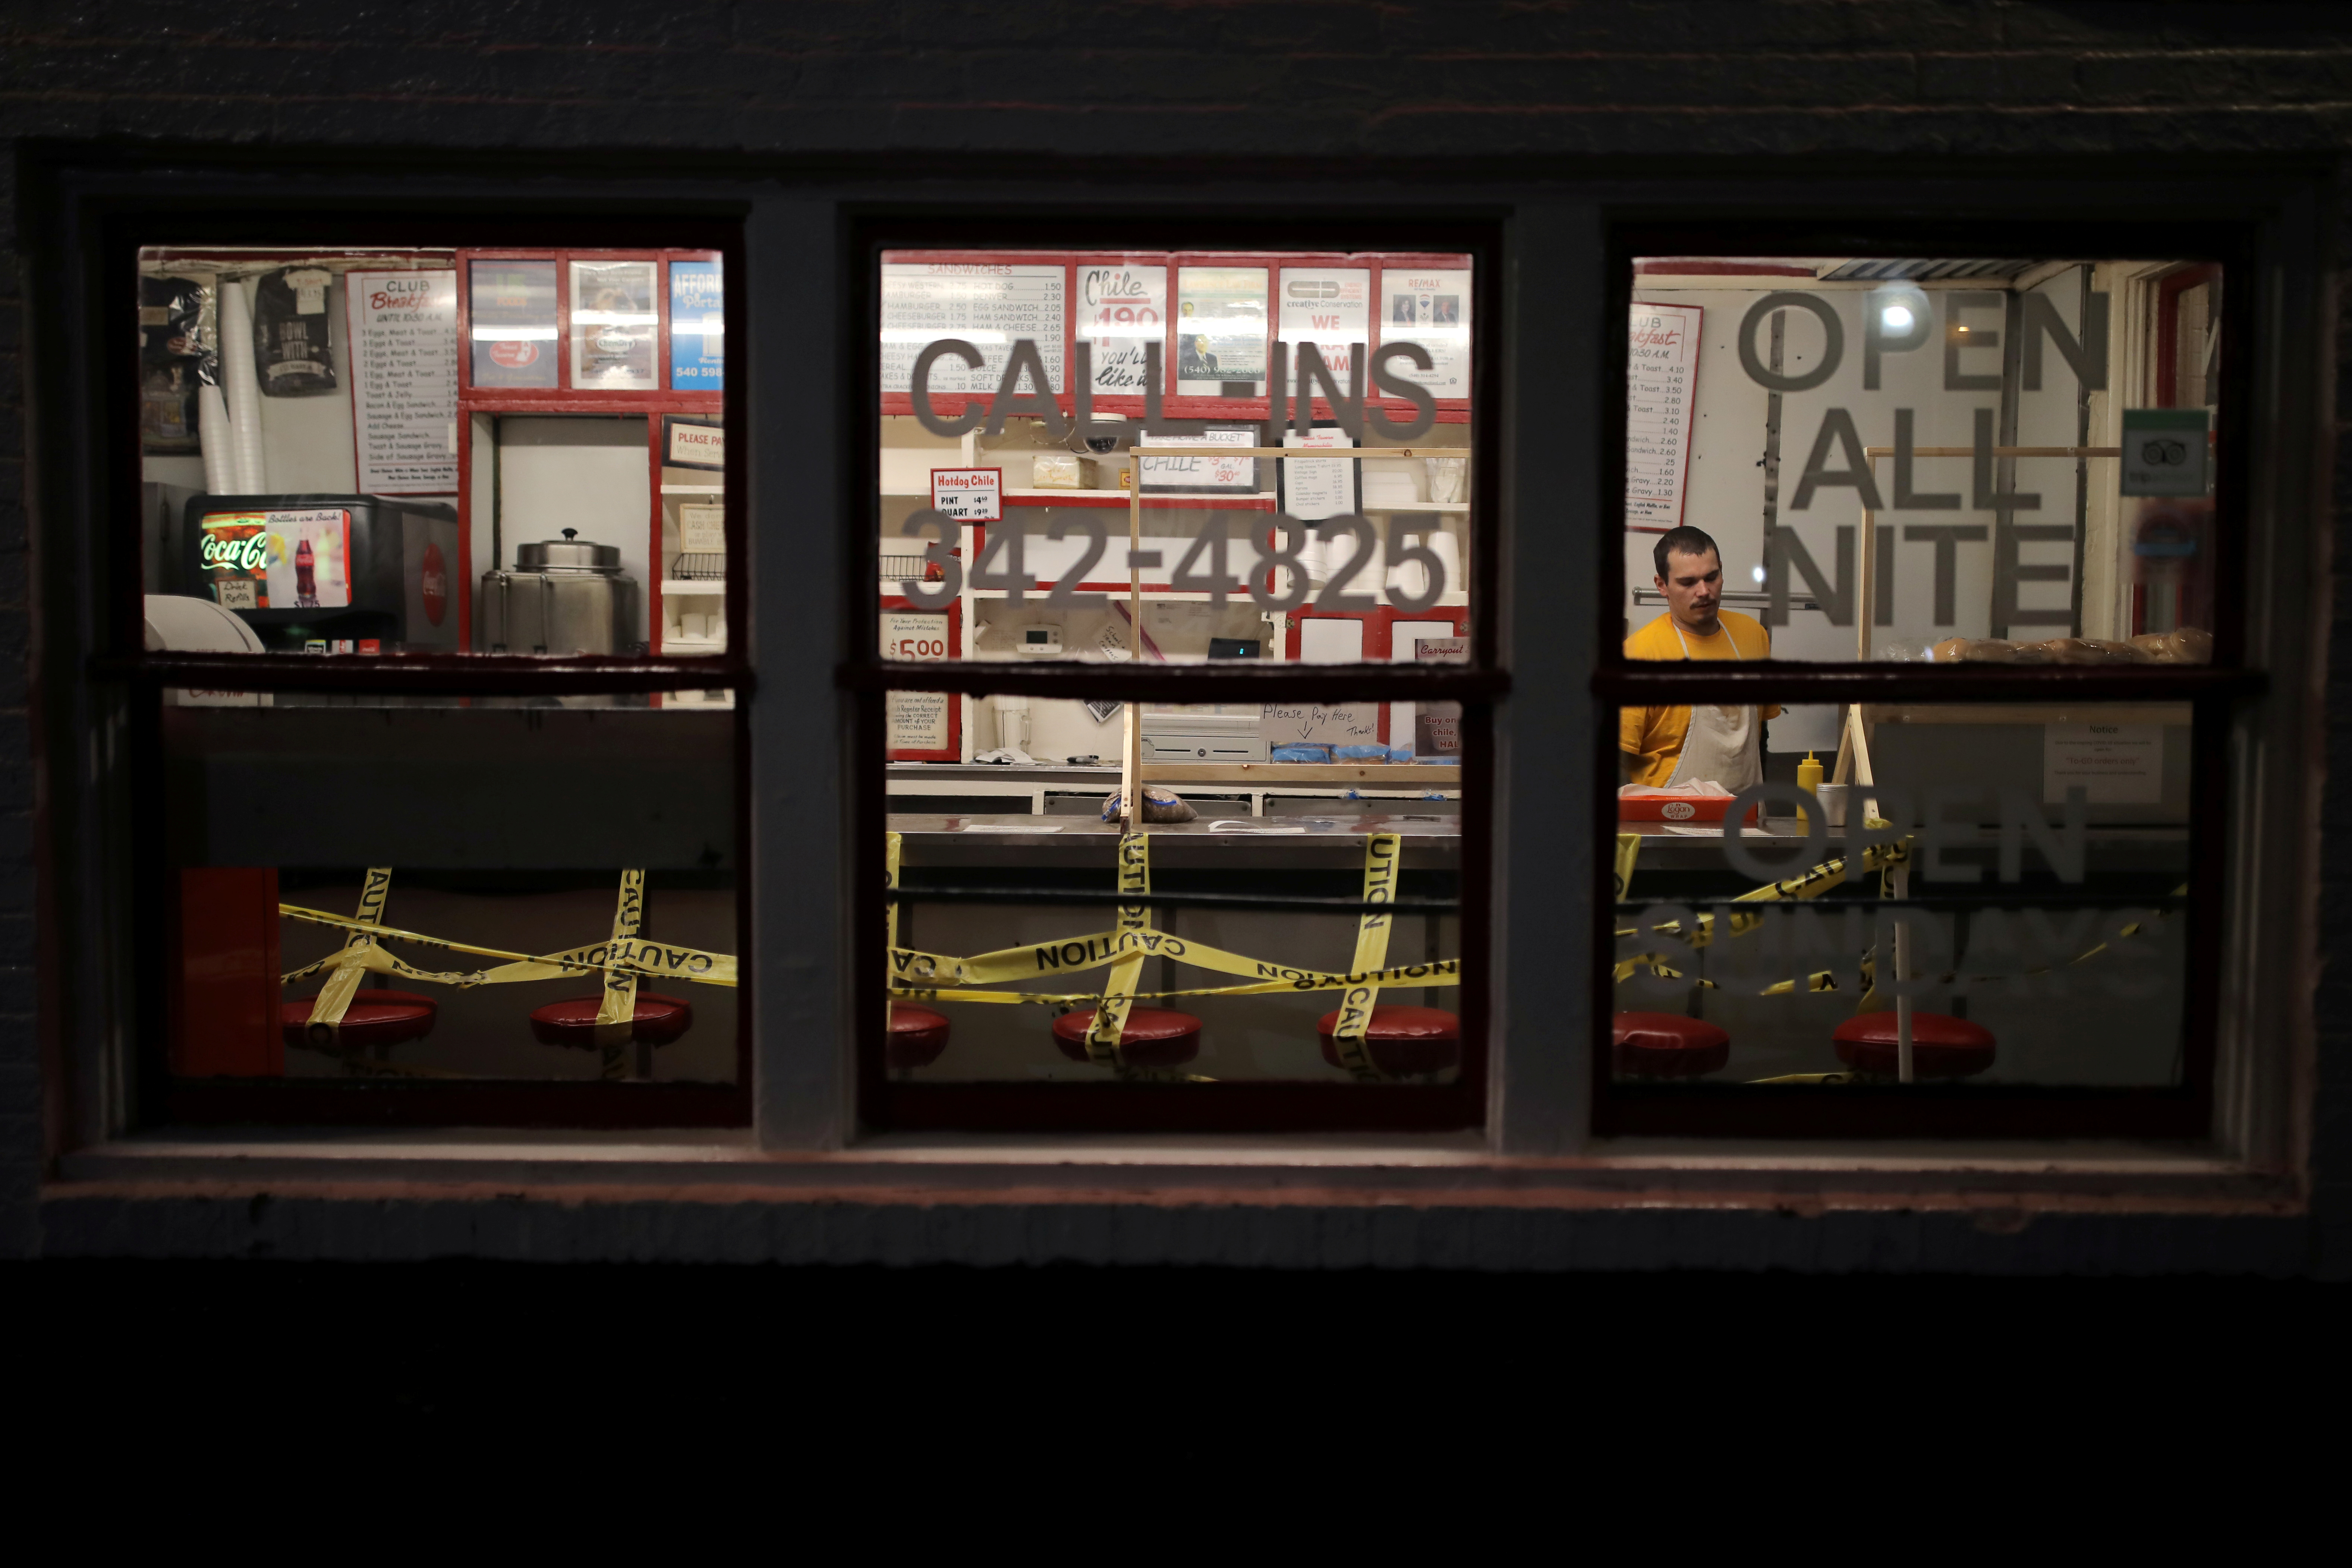 global us restaurant caution tape.'